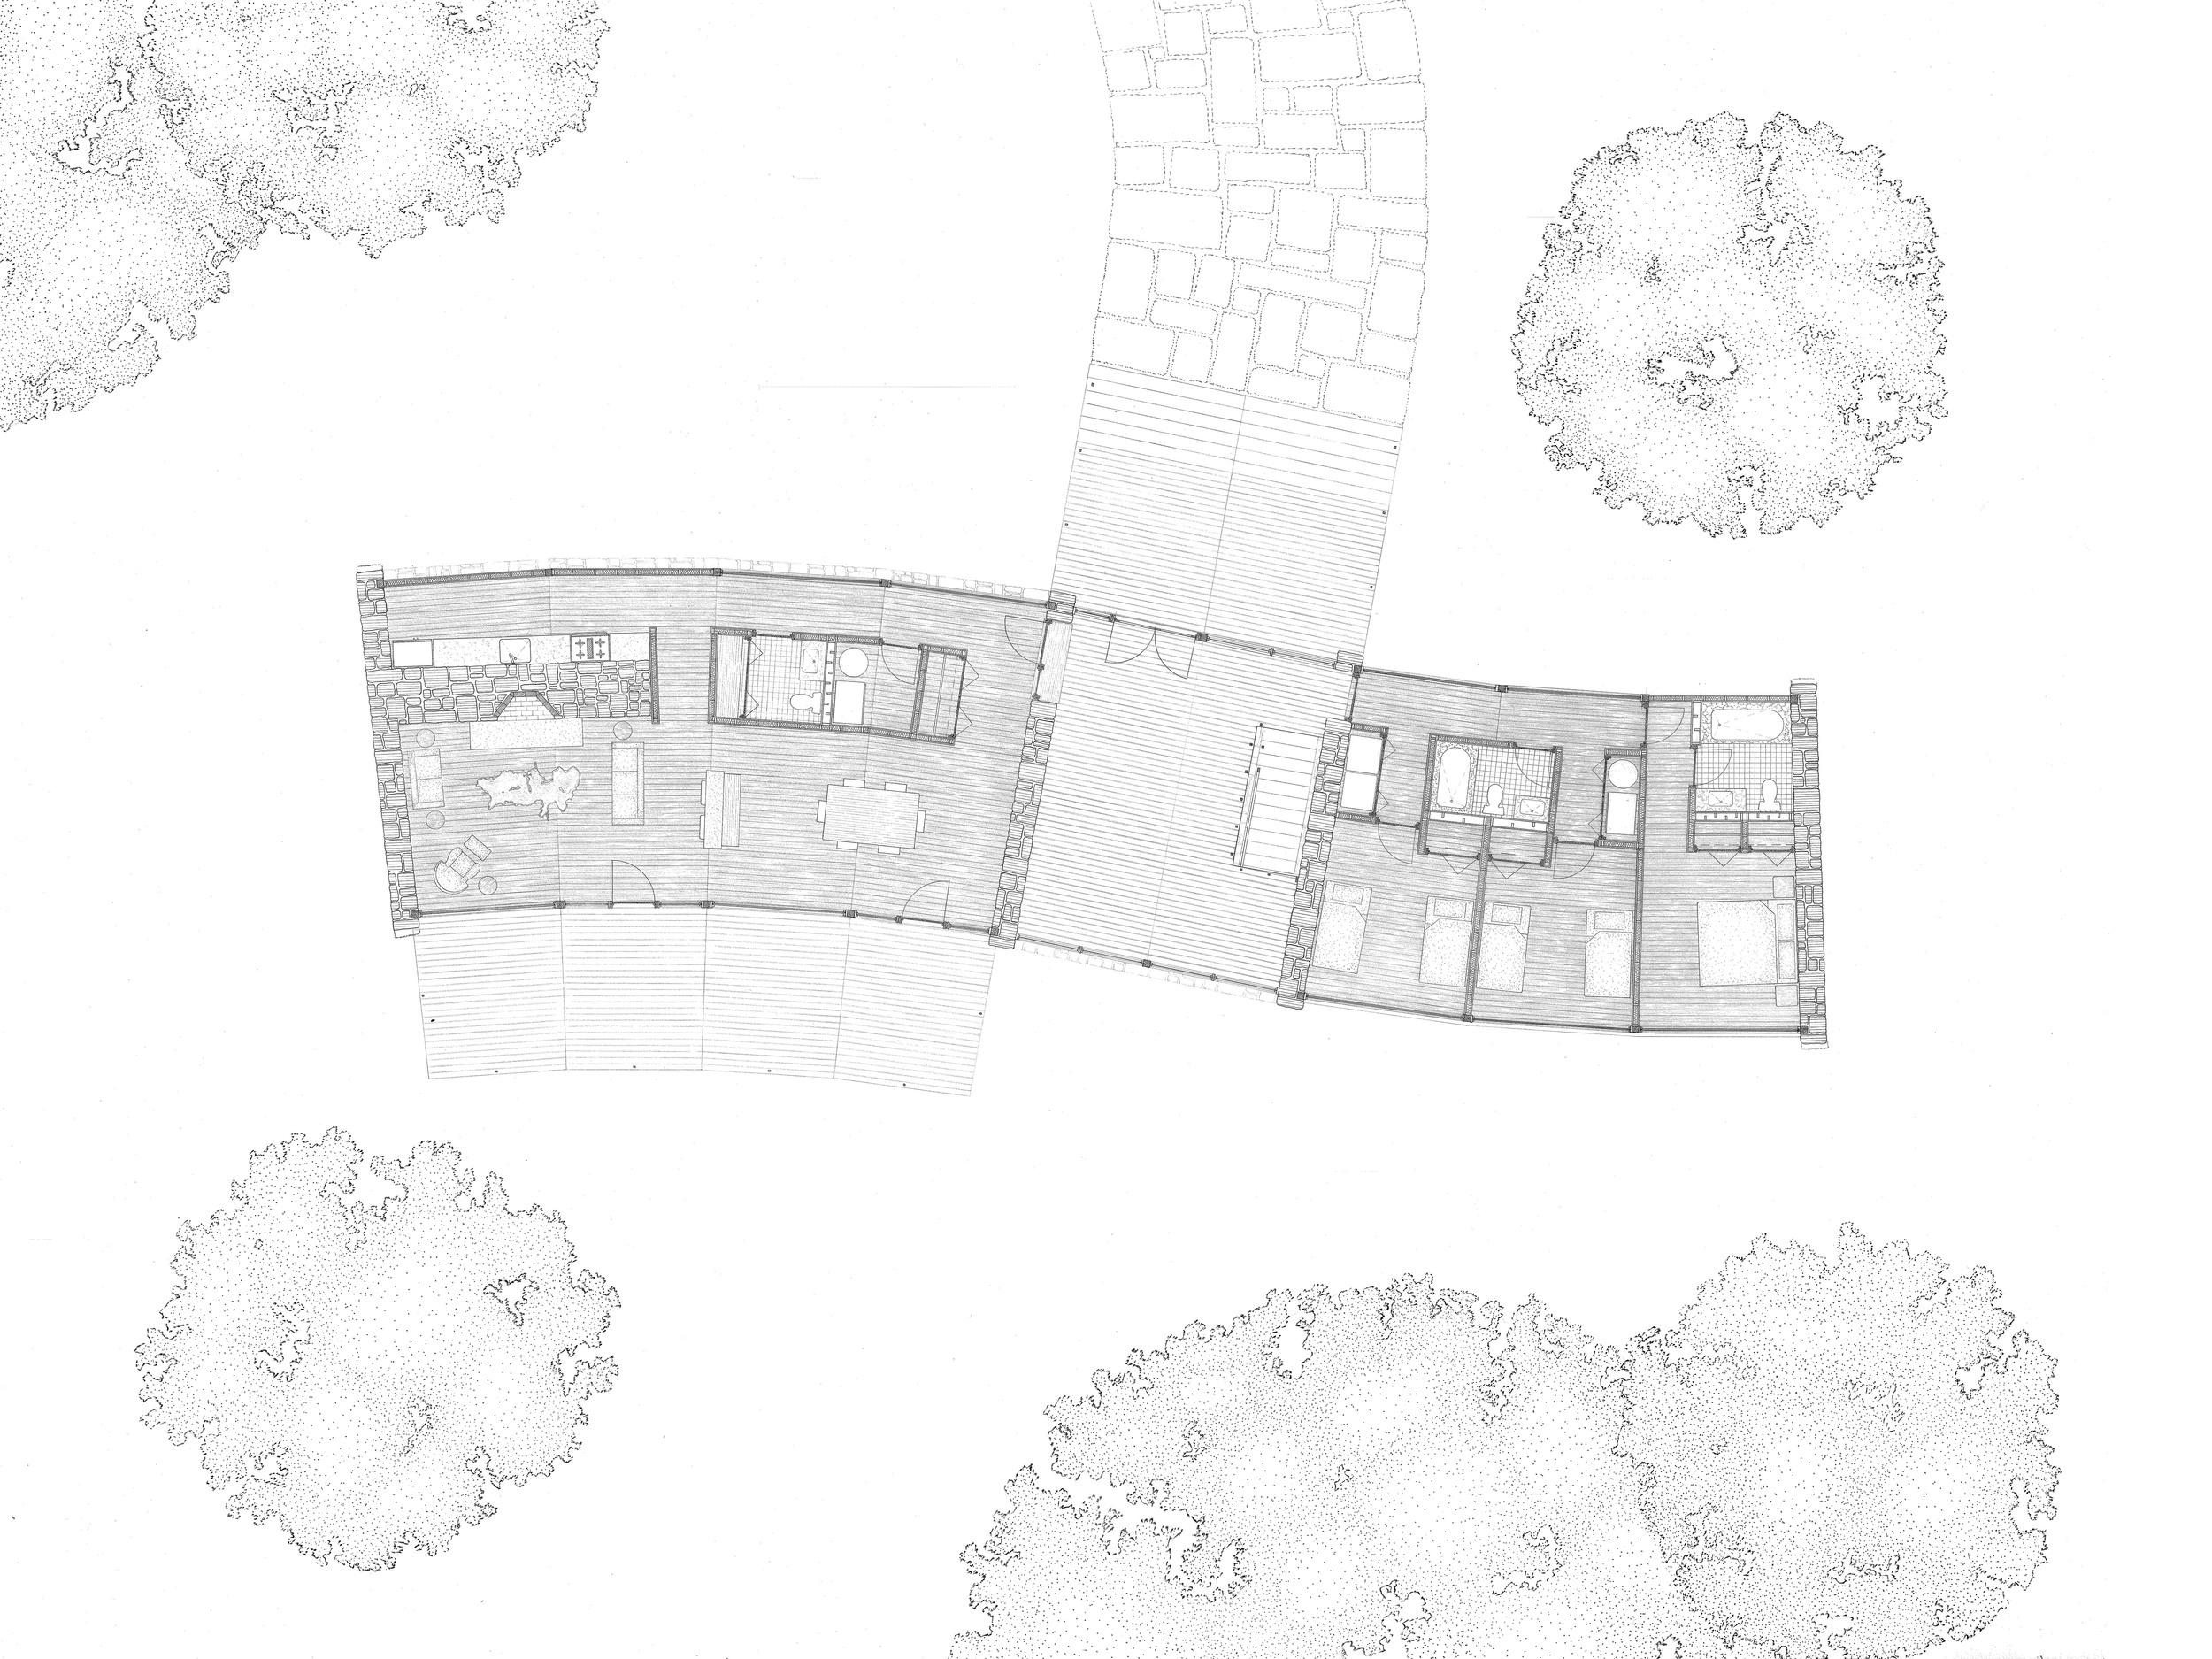 DESIGN_Vacation-Lake-House-01_3.jpg